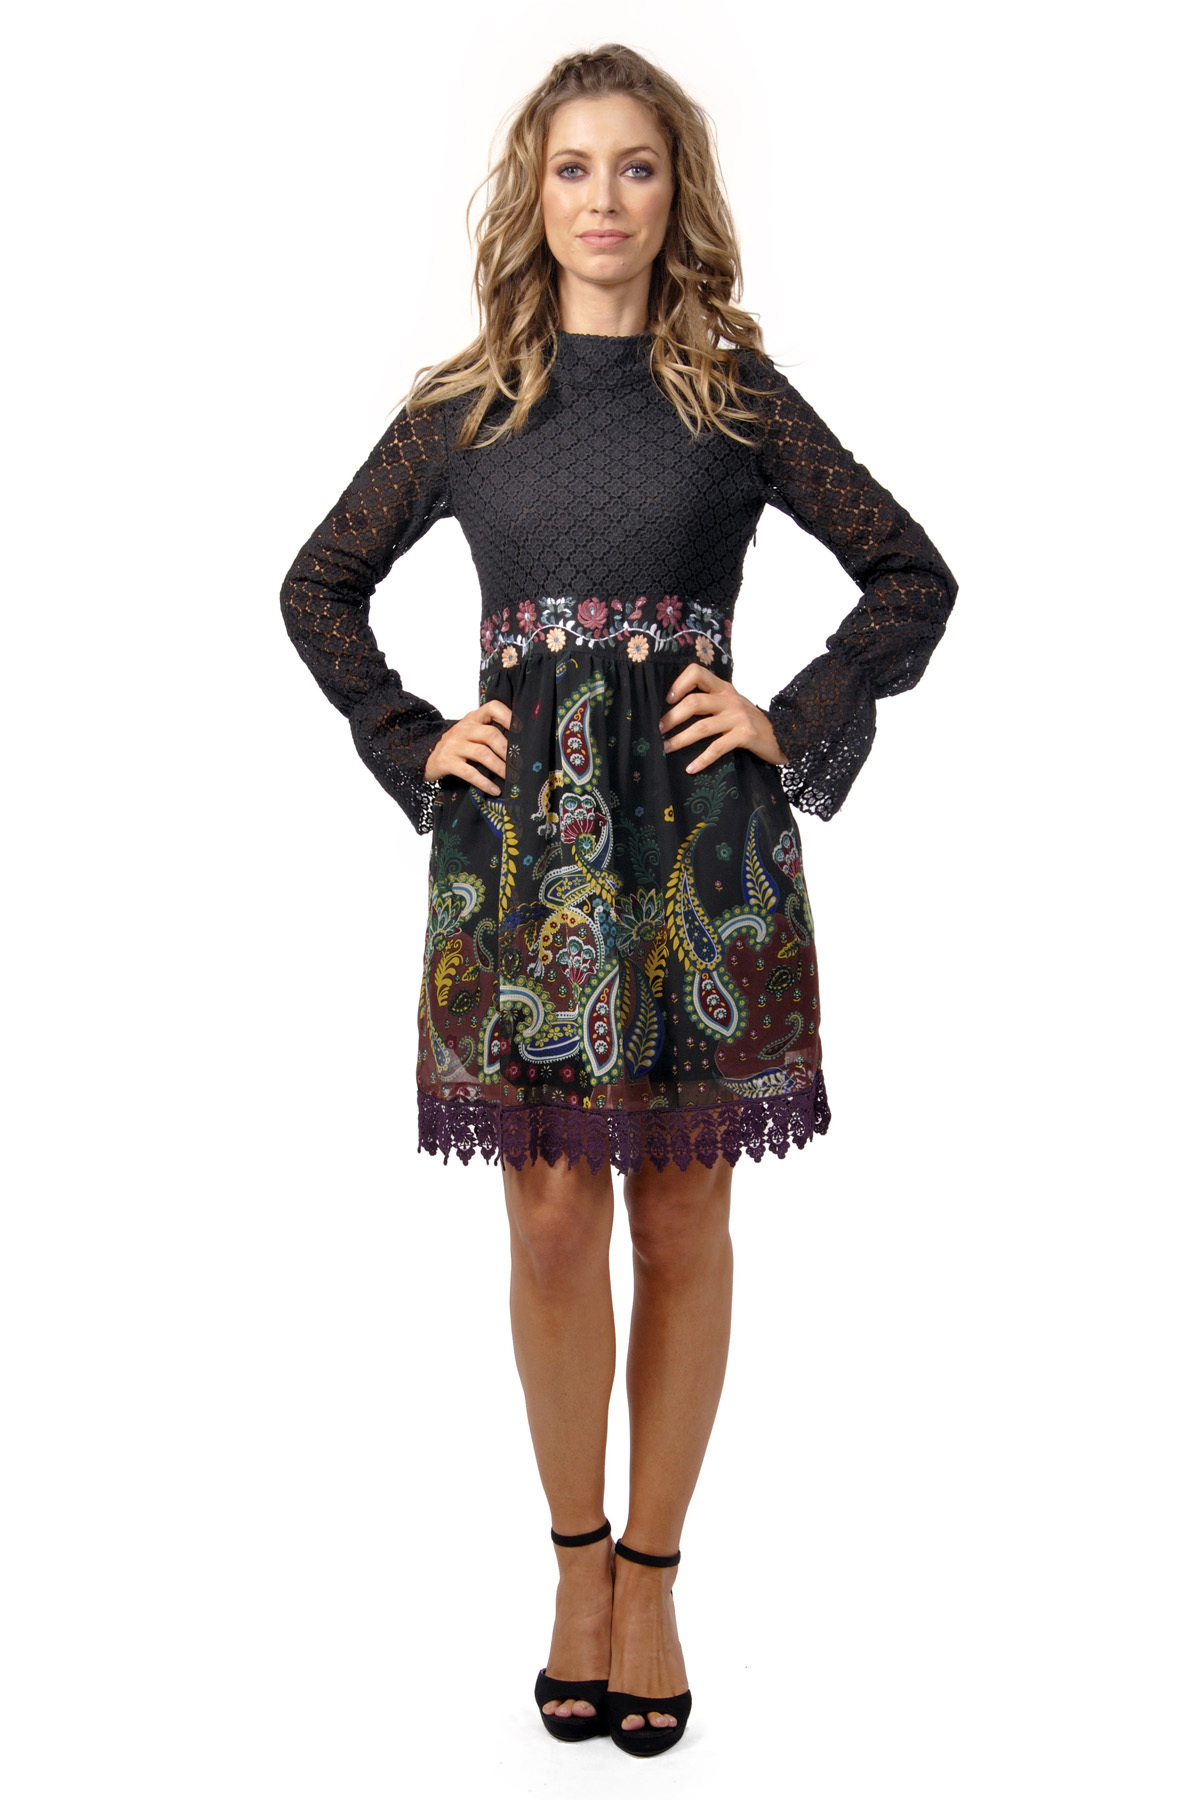 Savage Culture: Lounge In Love Arabesque Dress Alicia SAVAGE_30275